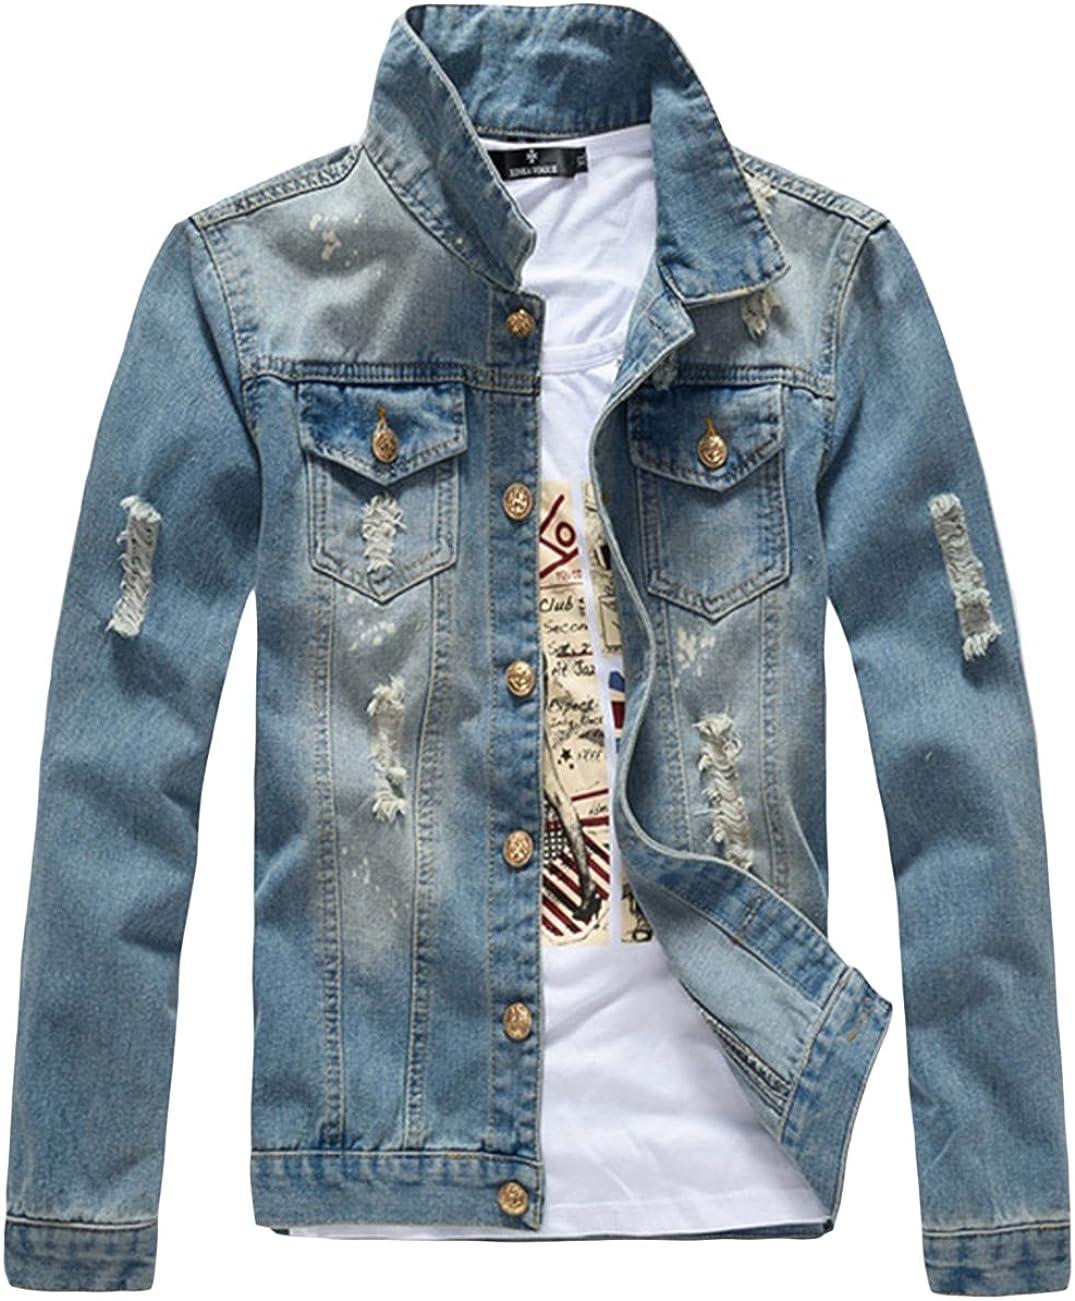 sandbank Men¡¯s Classic Button Slim Fit Ripped Washed Denim Jacket Jean Coat